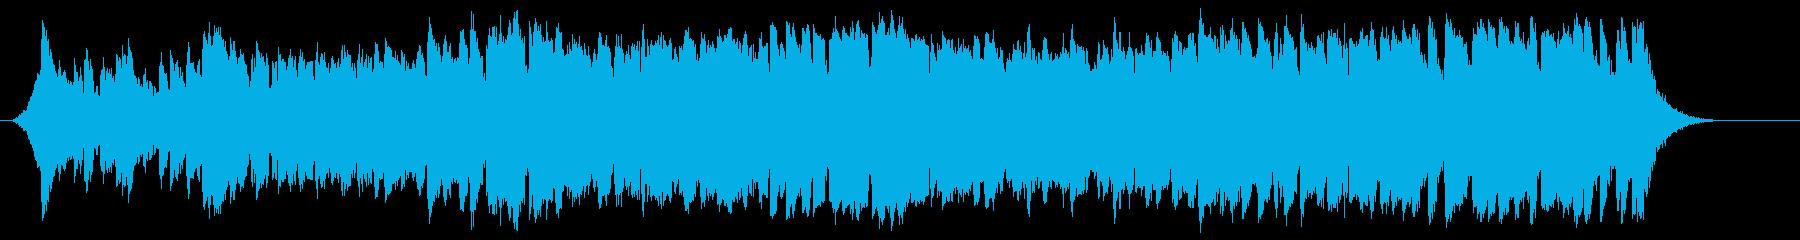 RPGの序盤で使える爽やかなオーケストラの再生済みの波形